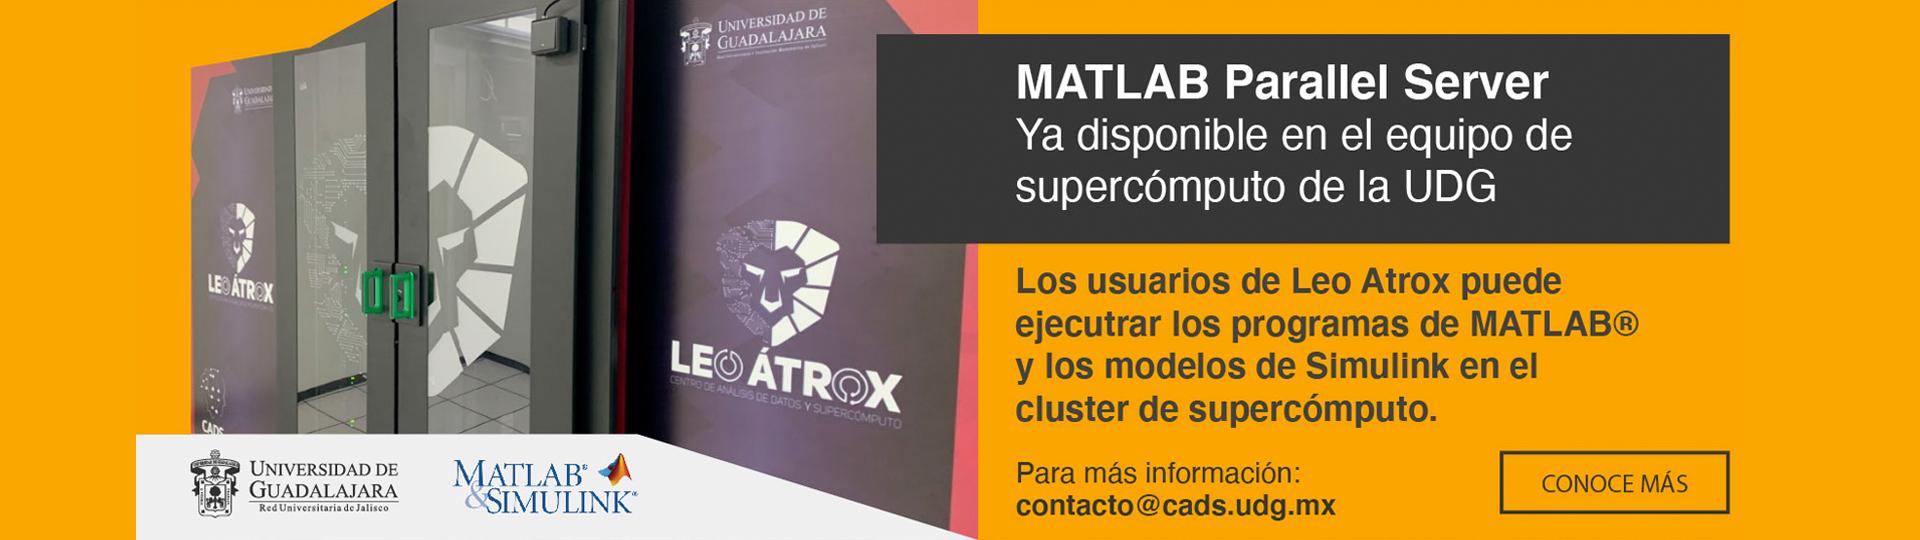 MatLab Paralle Server